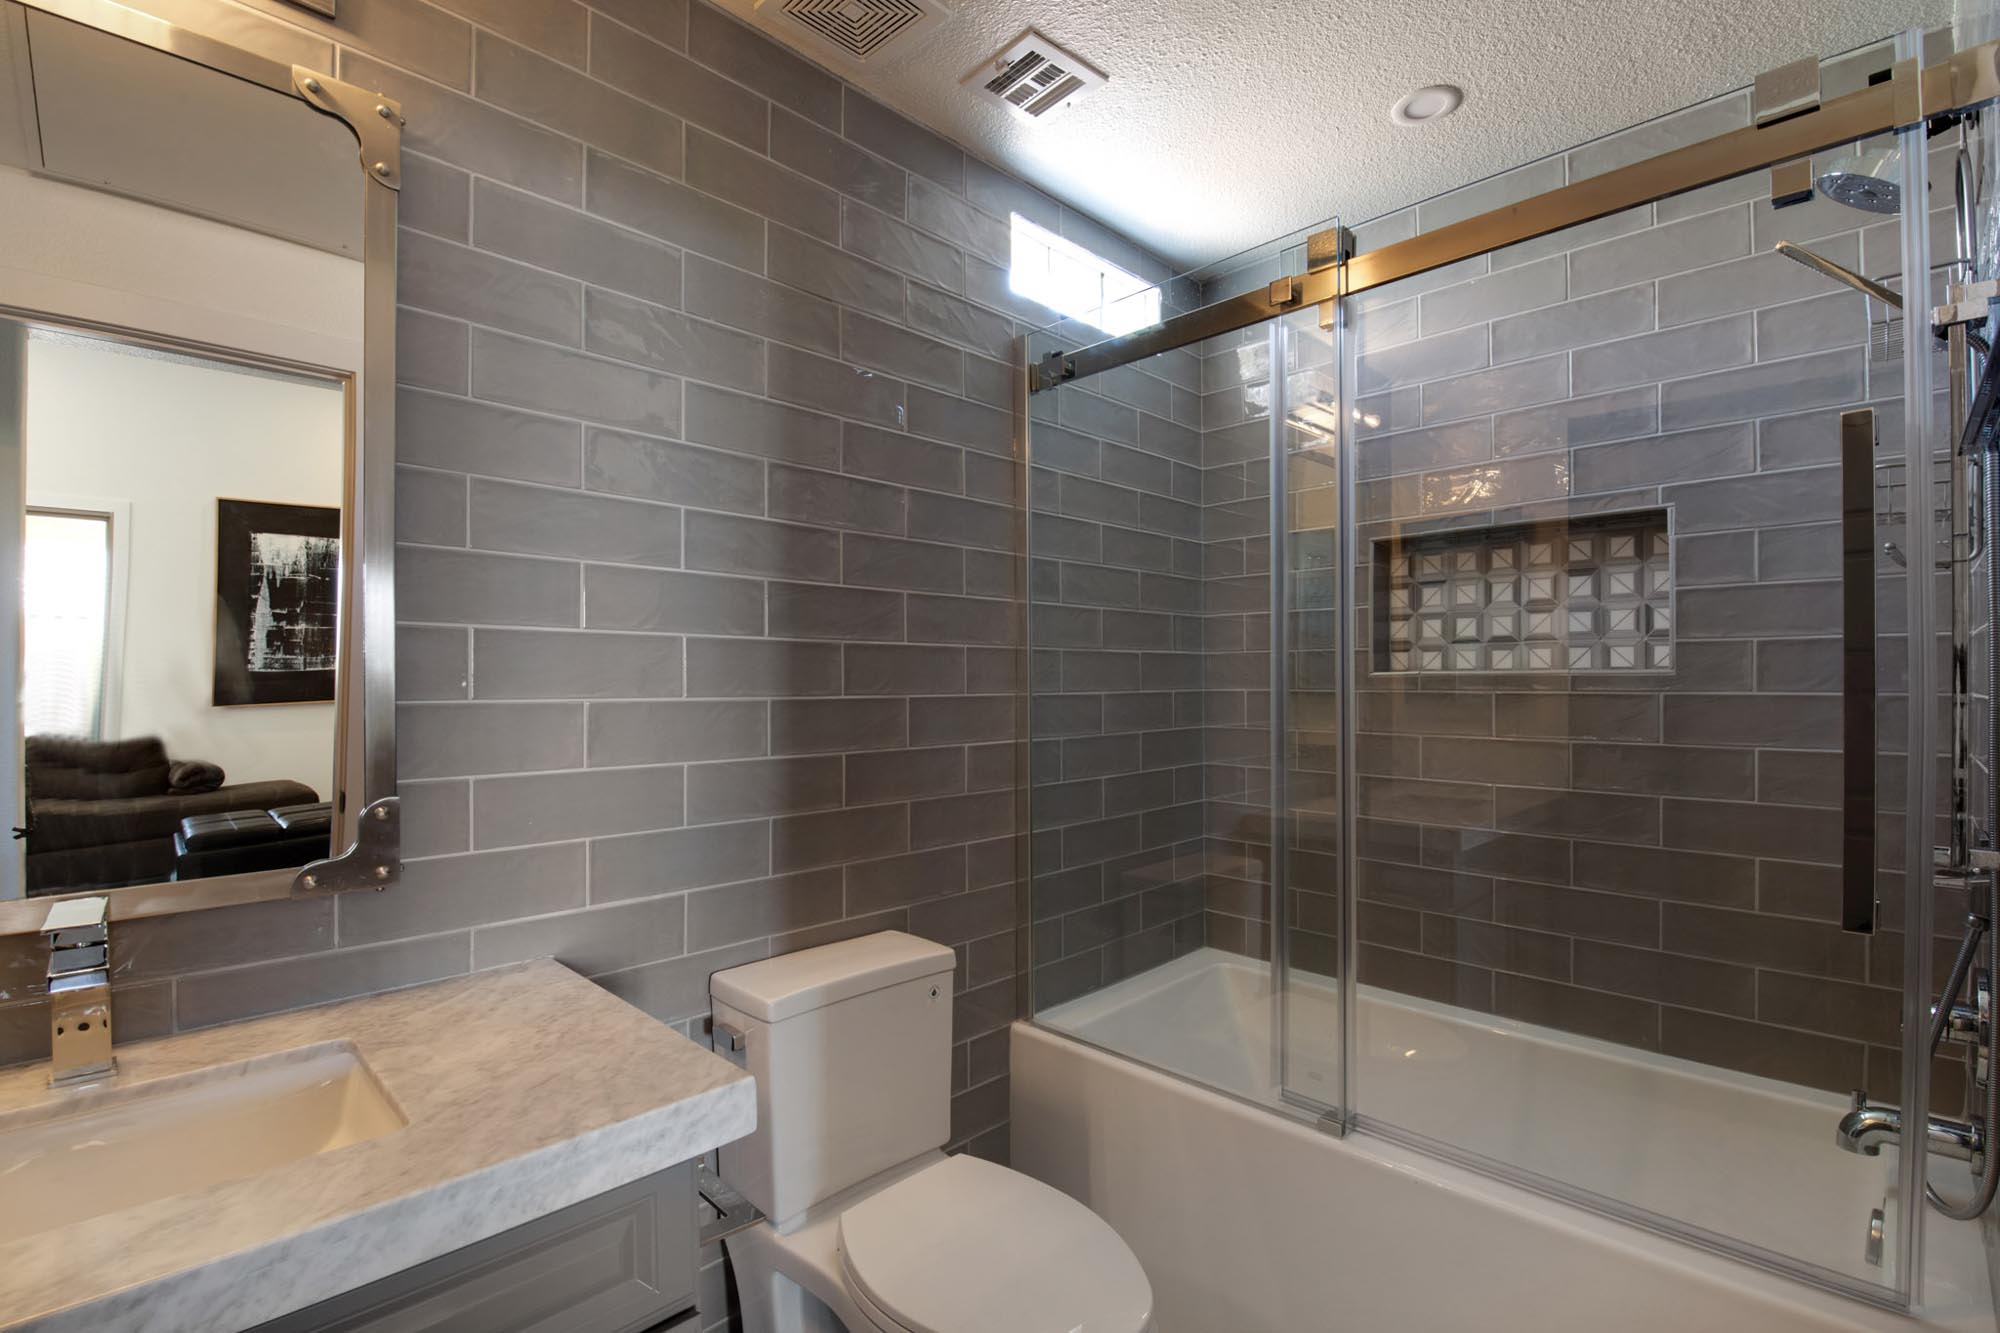 Modern style bathroom with white toilet and bathtub